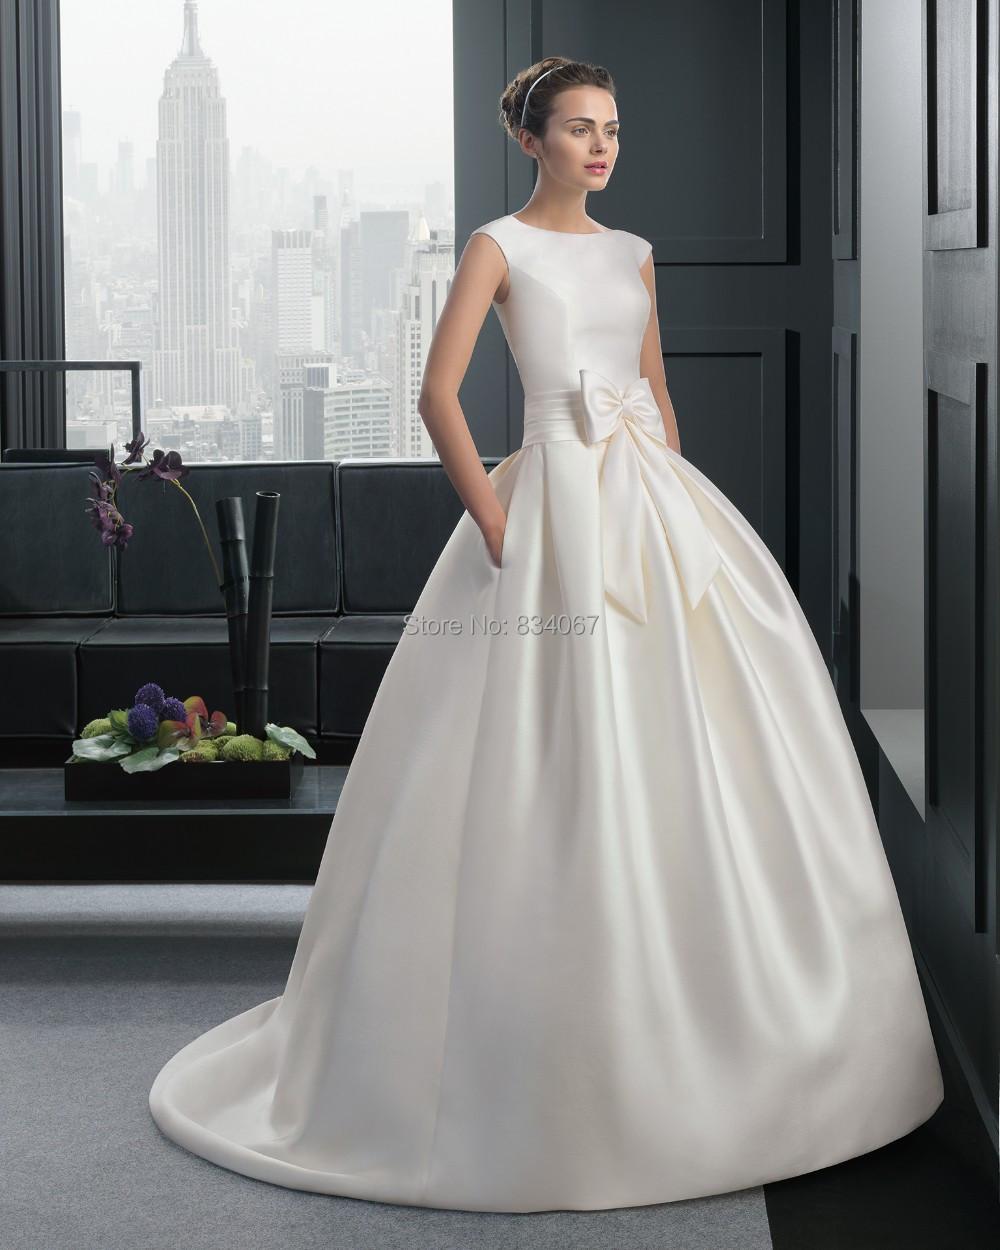 Modest wedding dress bow 2015 elegant bridal gown ball for Modest elegant wedding dresses